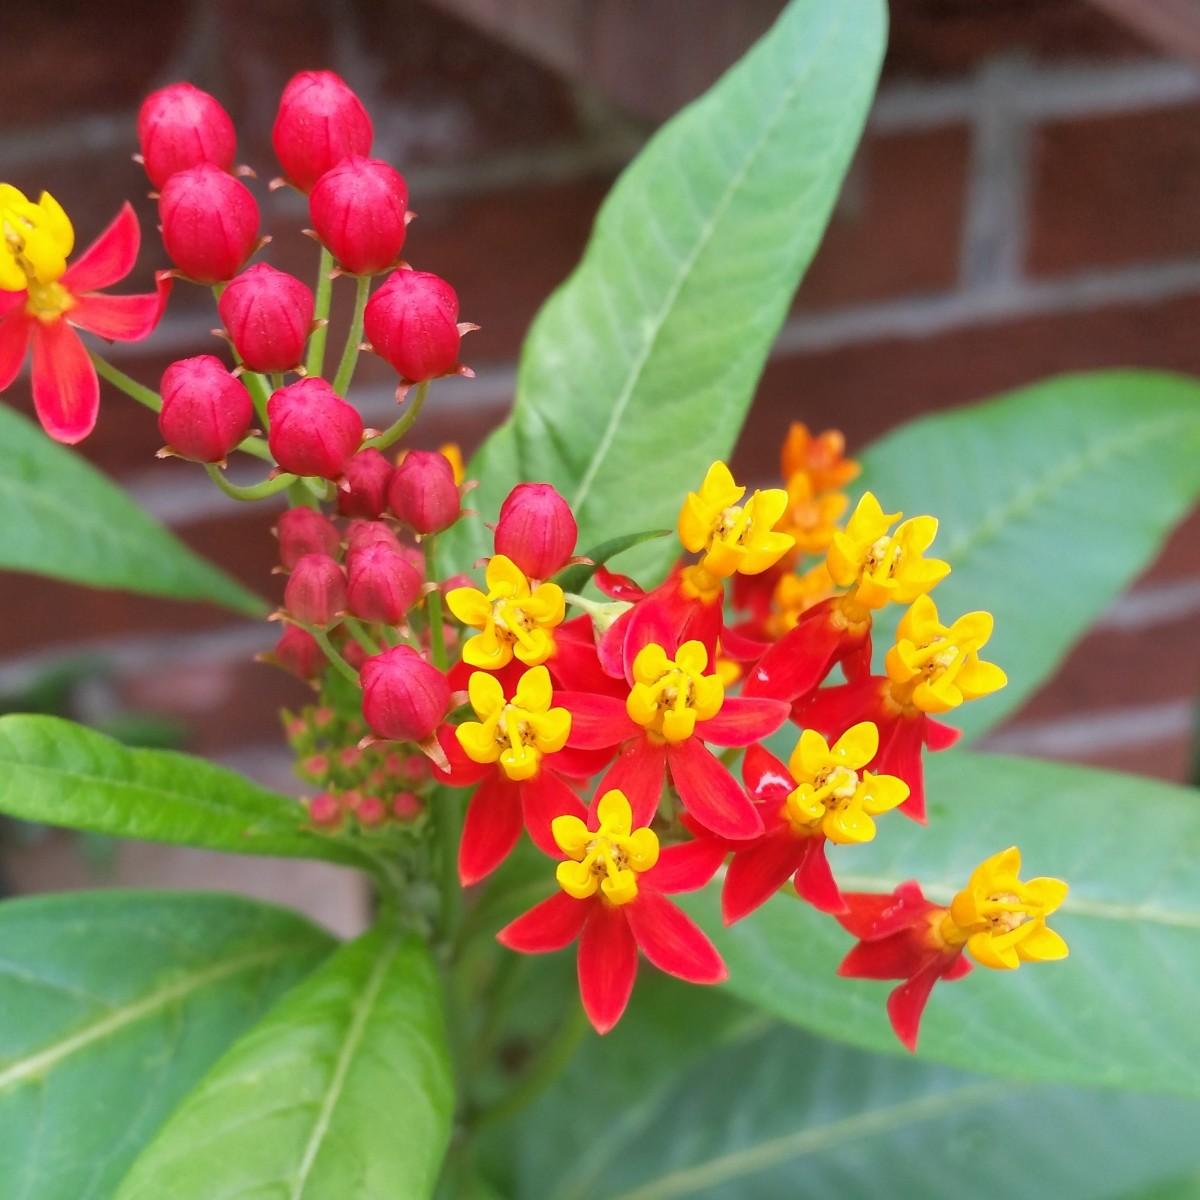 Free Images Leaf Flower Orange Produce Evergreen